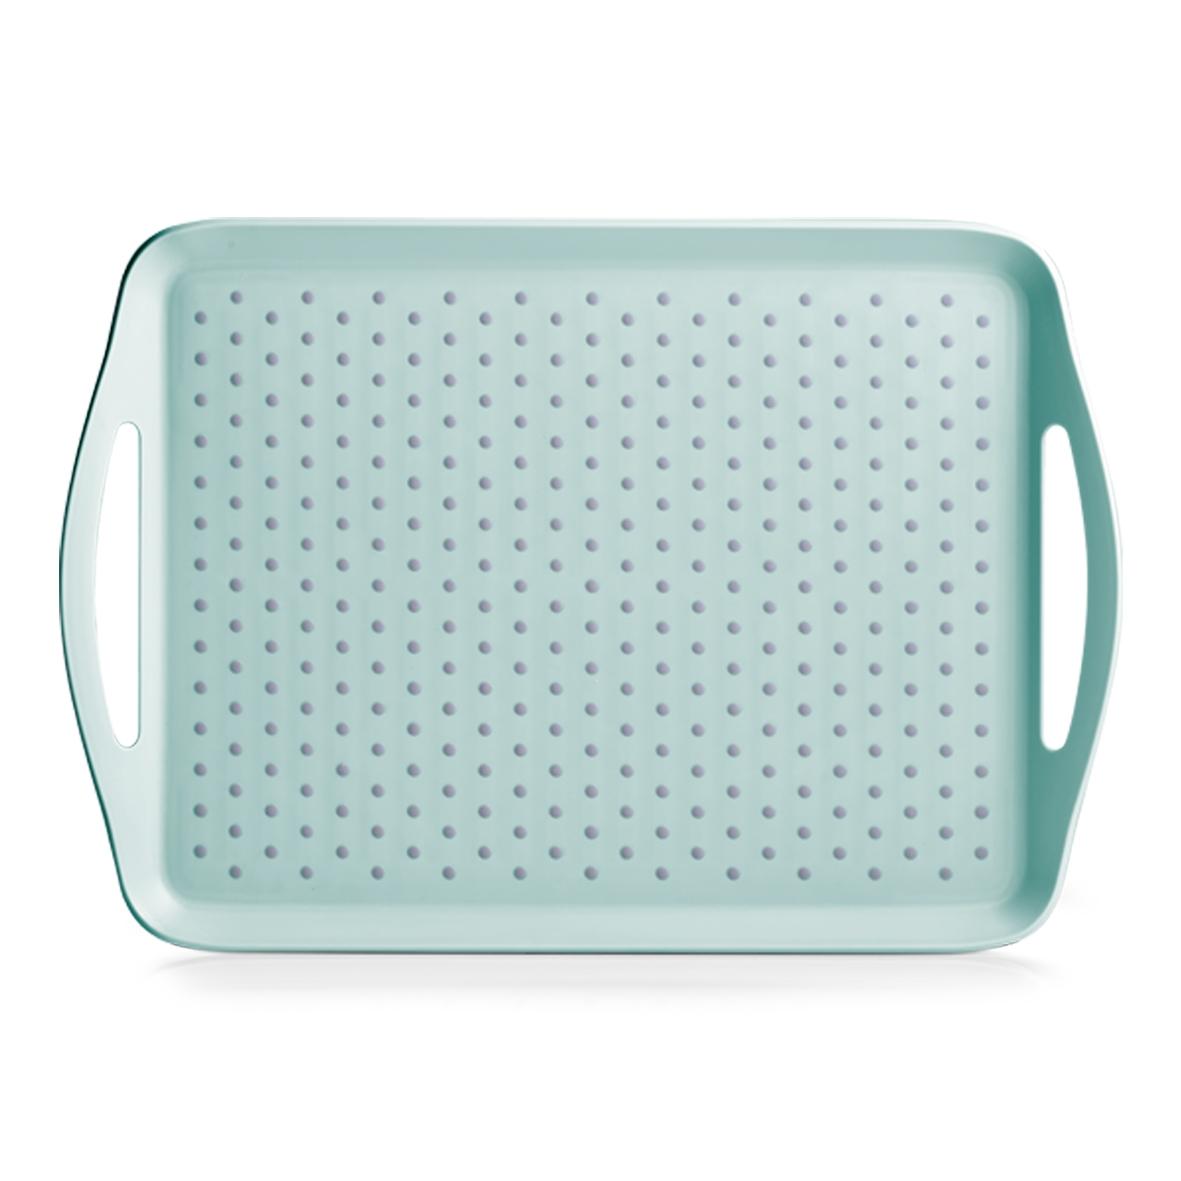 Tava pentru servire Anti-Slip, Plastic, l45,5xA32xH4,5 cm-Verde Mint poza